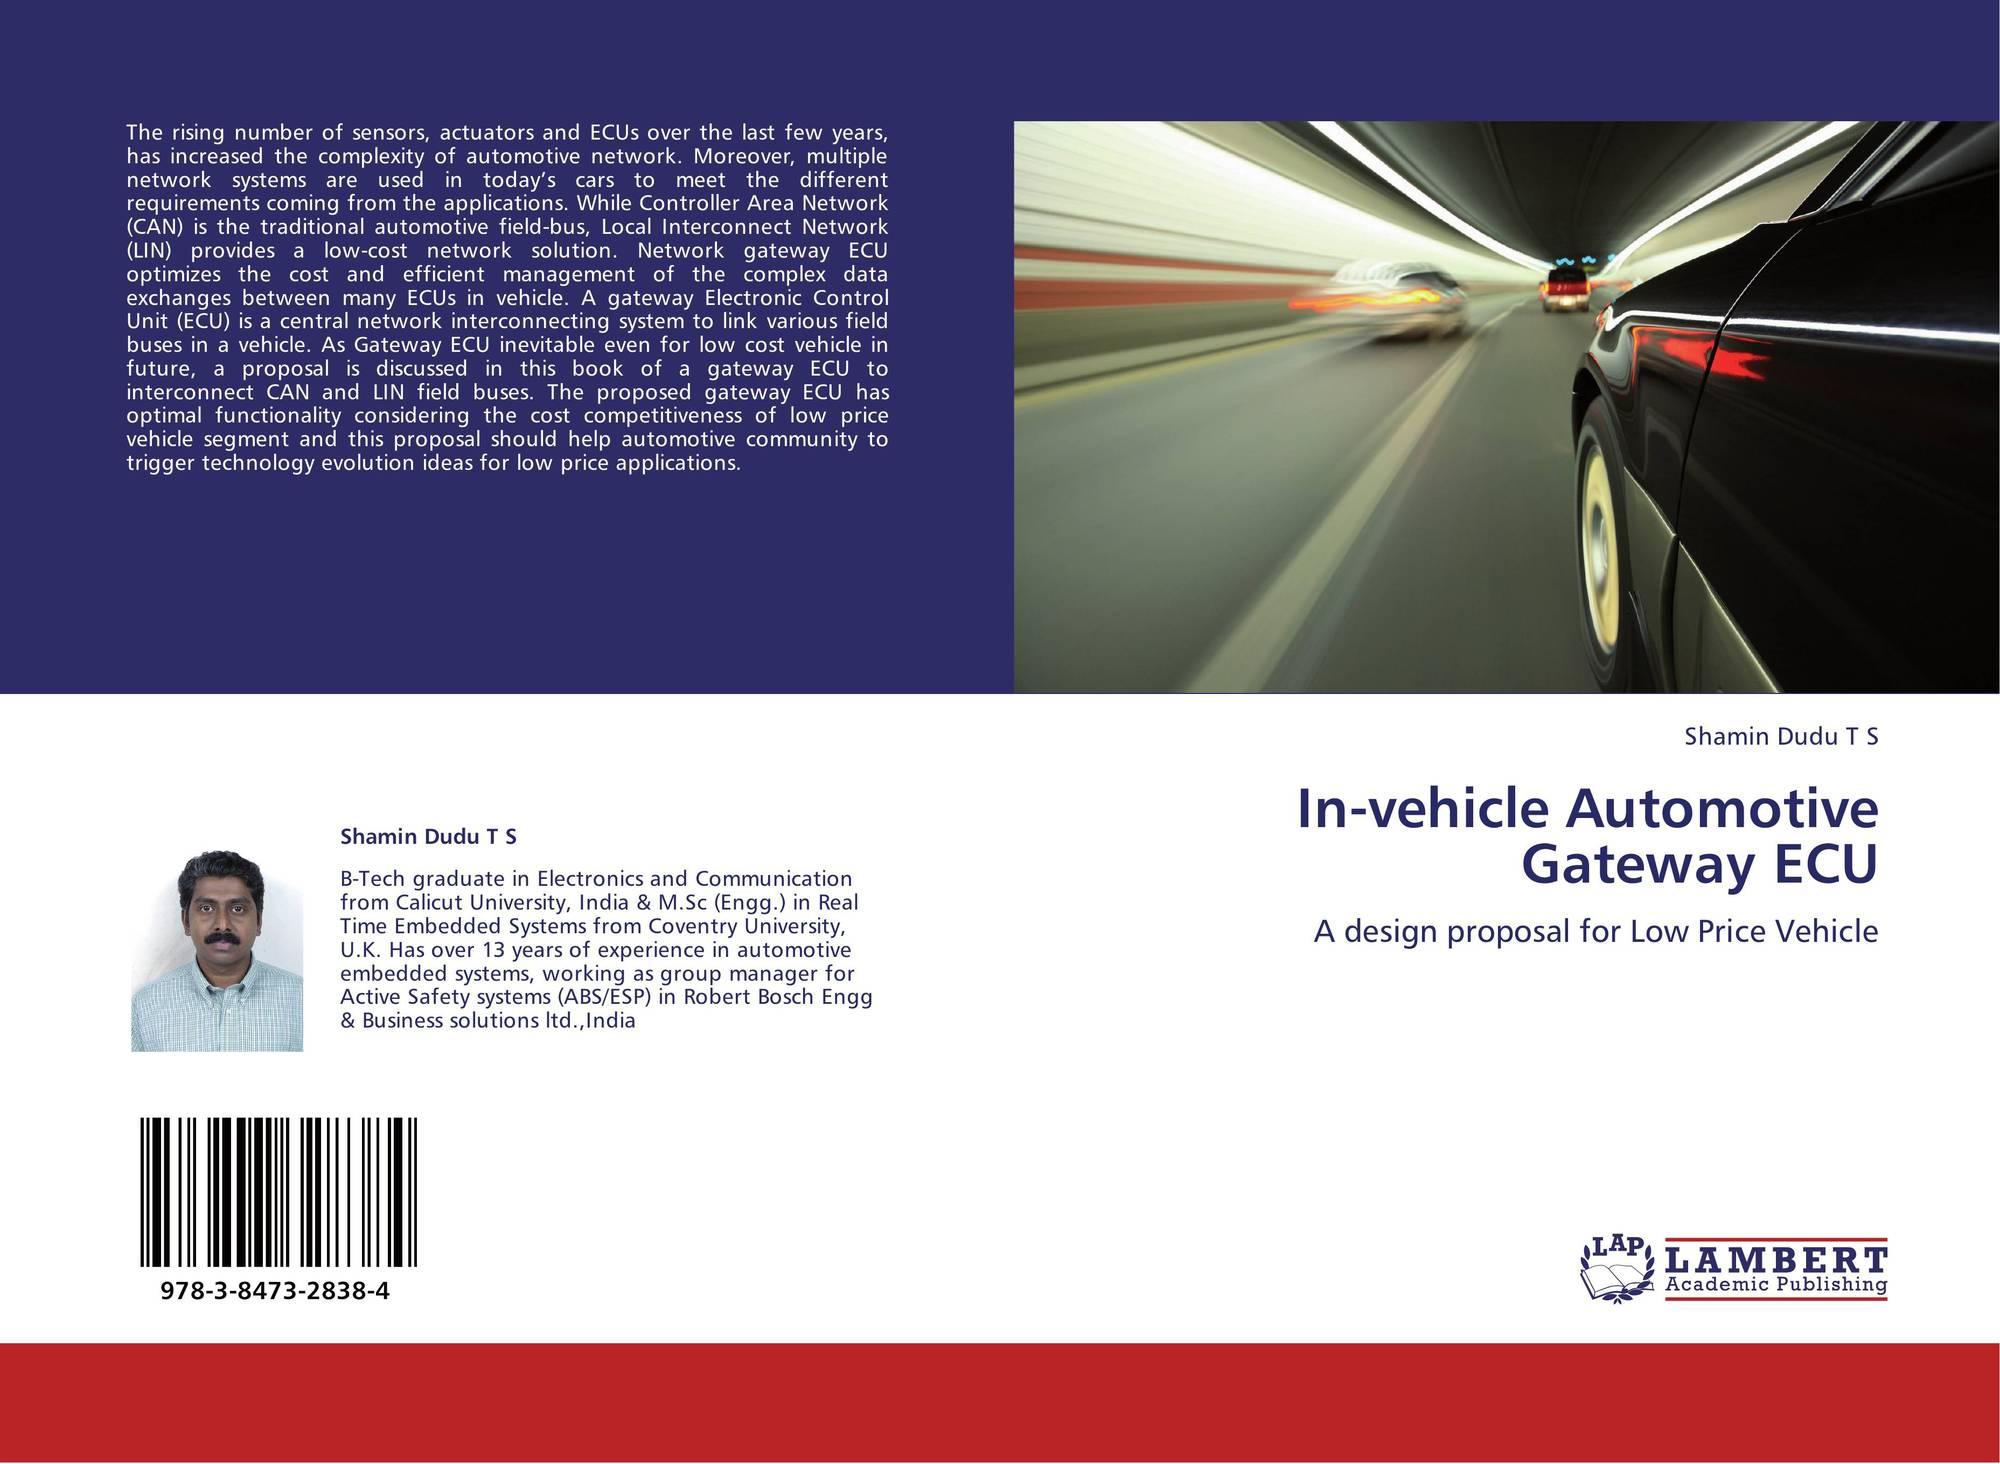 In-vehicle Automotive Gateway ECU, 978-3-8473-2838-4